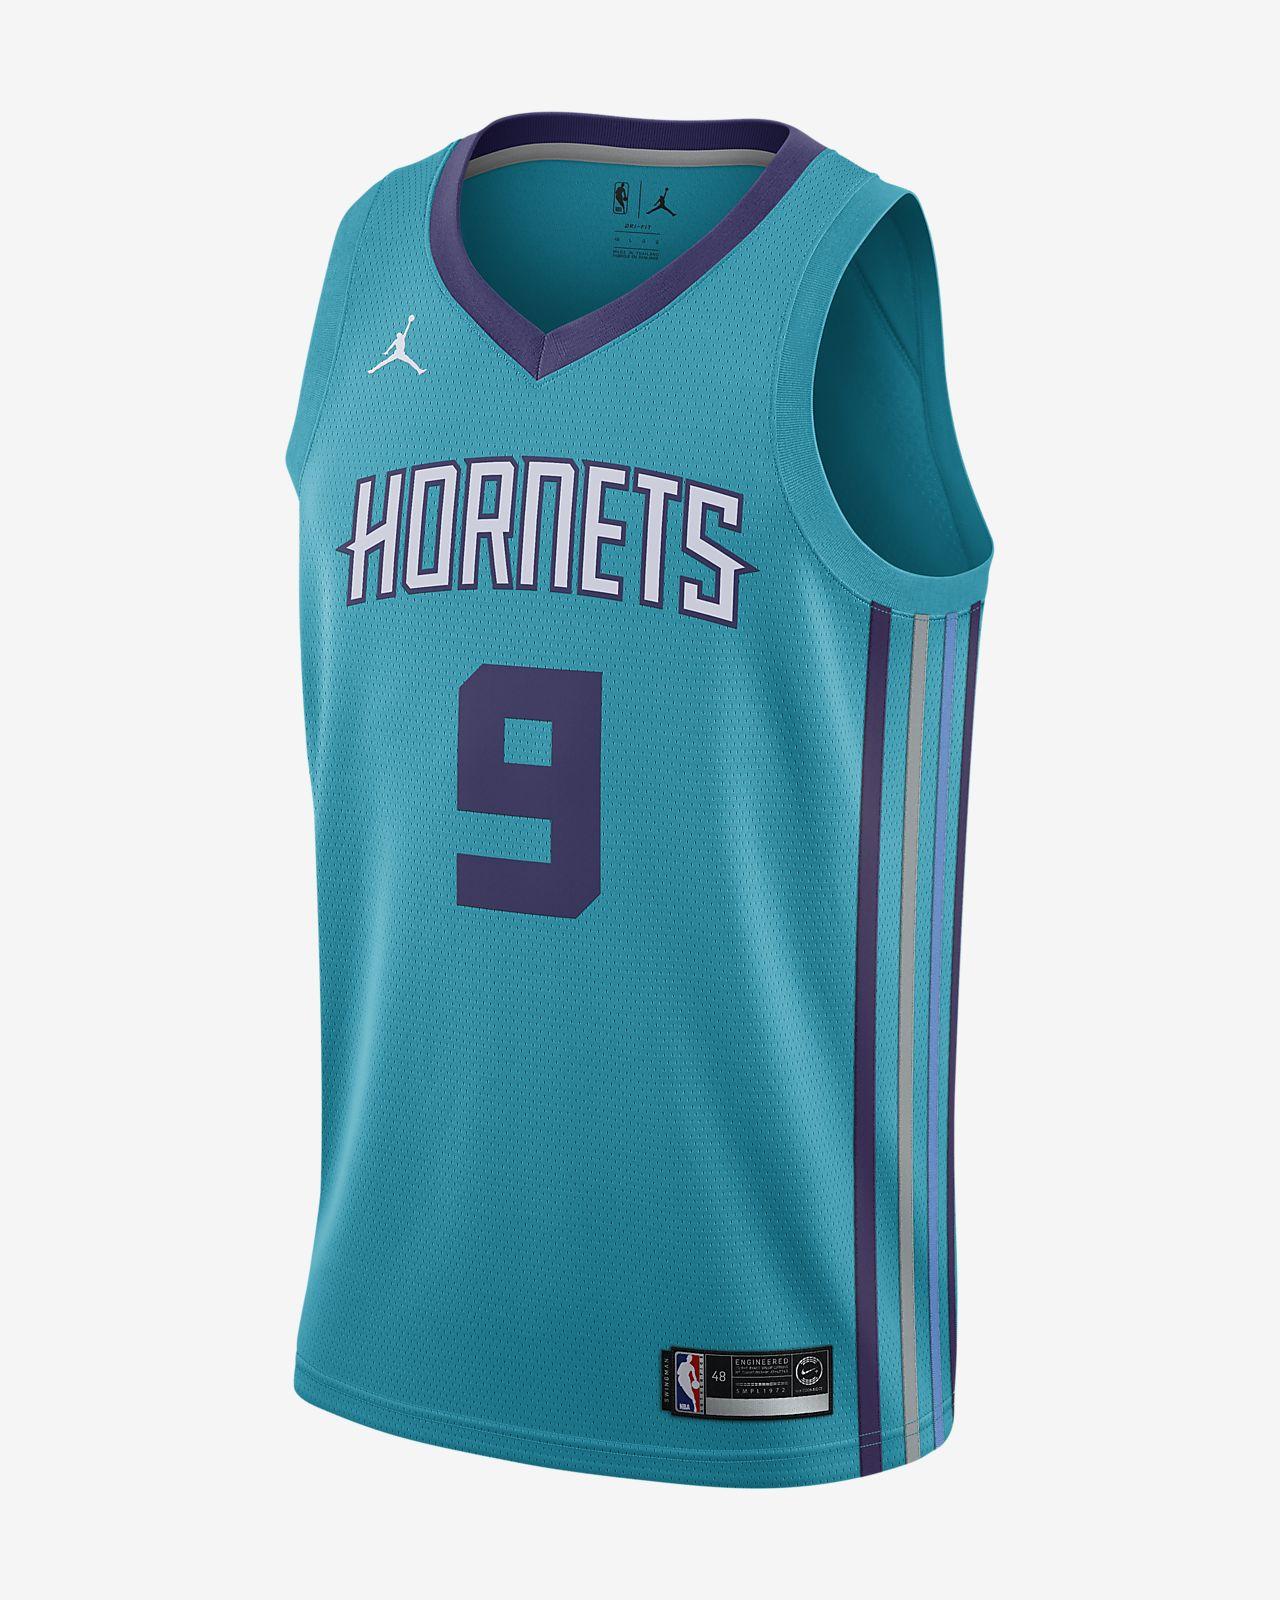 Мужское джерси Jordan НБА Icon Edition Swingman (Charlotte Hornets) с технологией NikeConnect